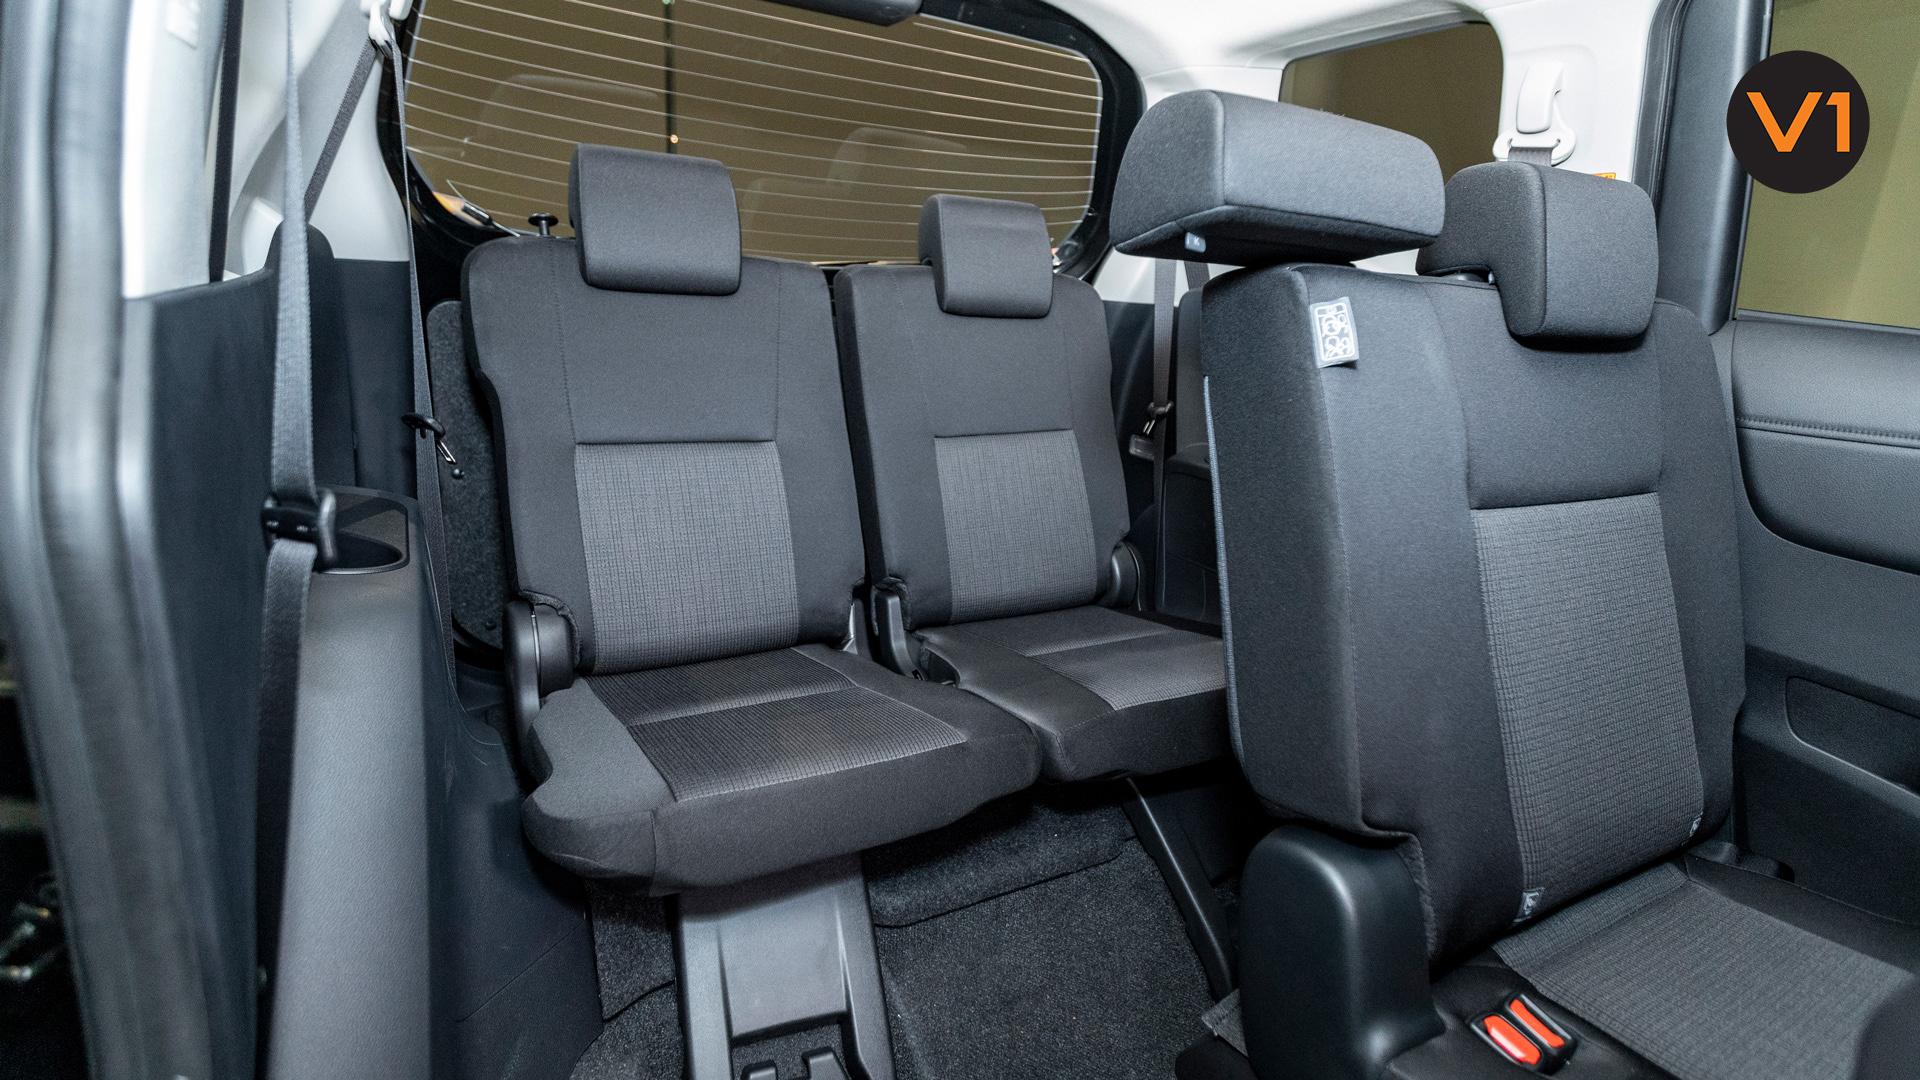 TOYOTA SIENTA 1.5G (NEW FACELIFT) LED - Rear Seat